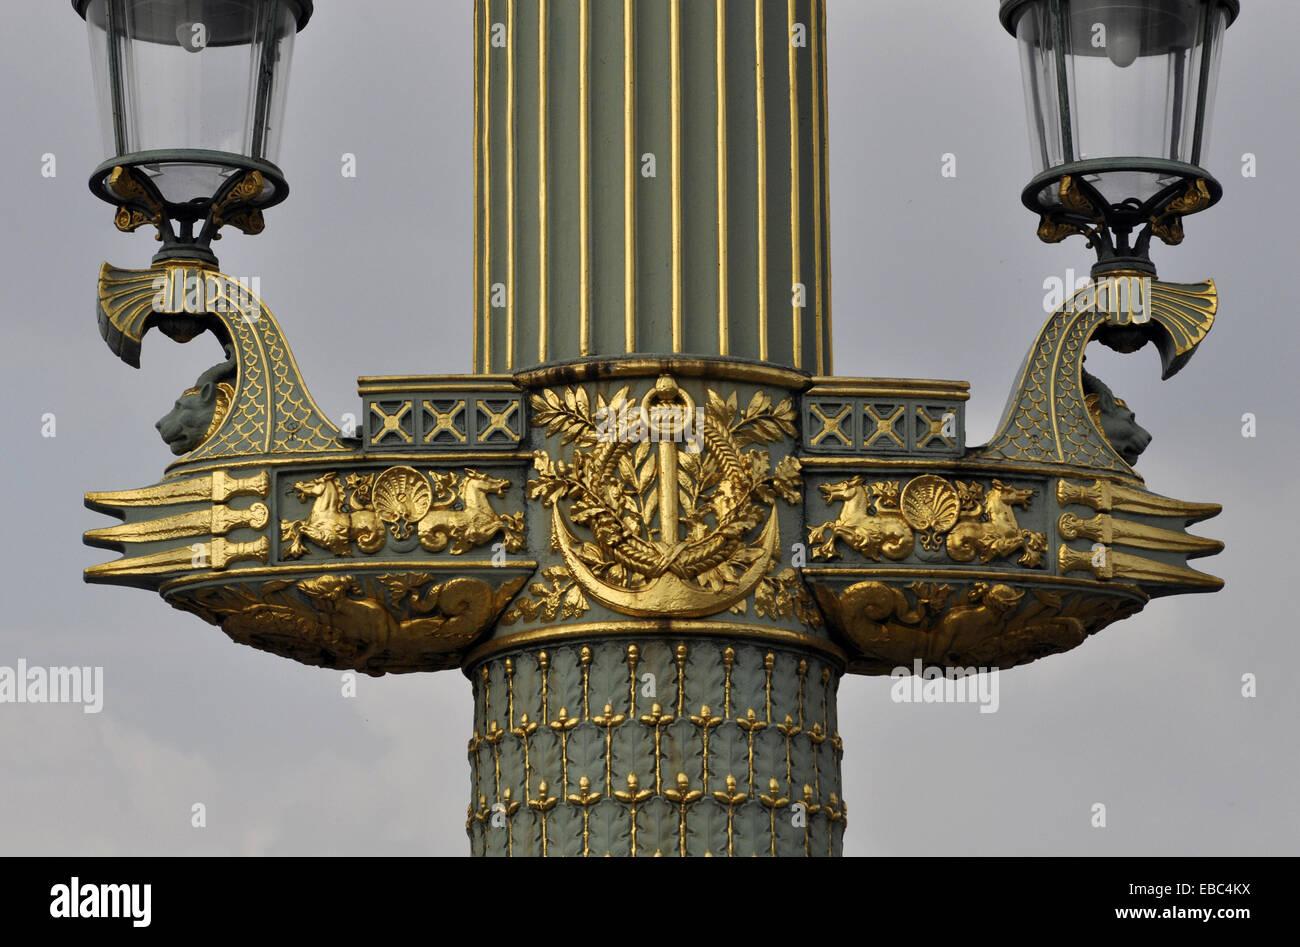 Paris France Art Deco Lamp With Egyptian Influences